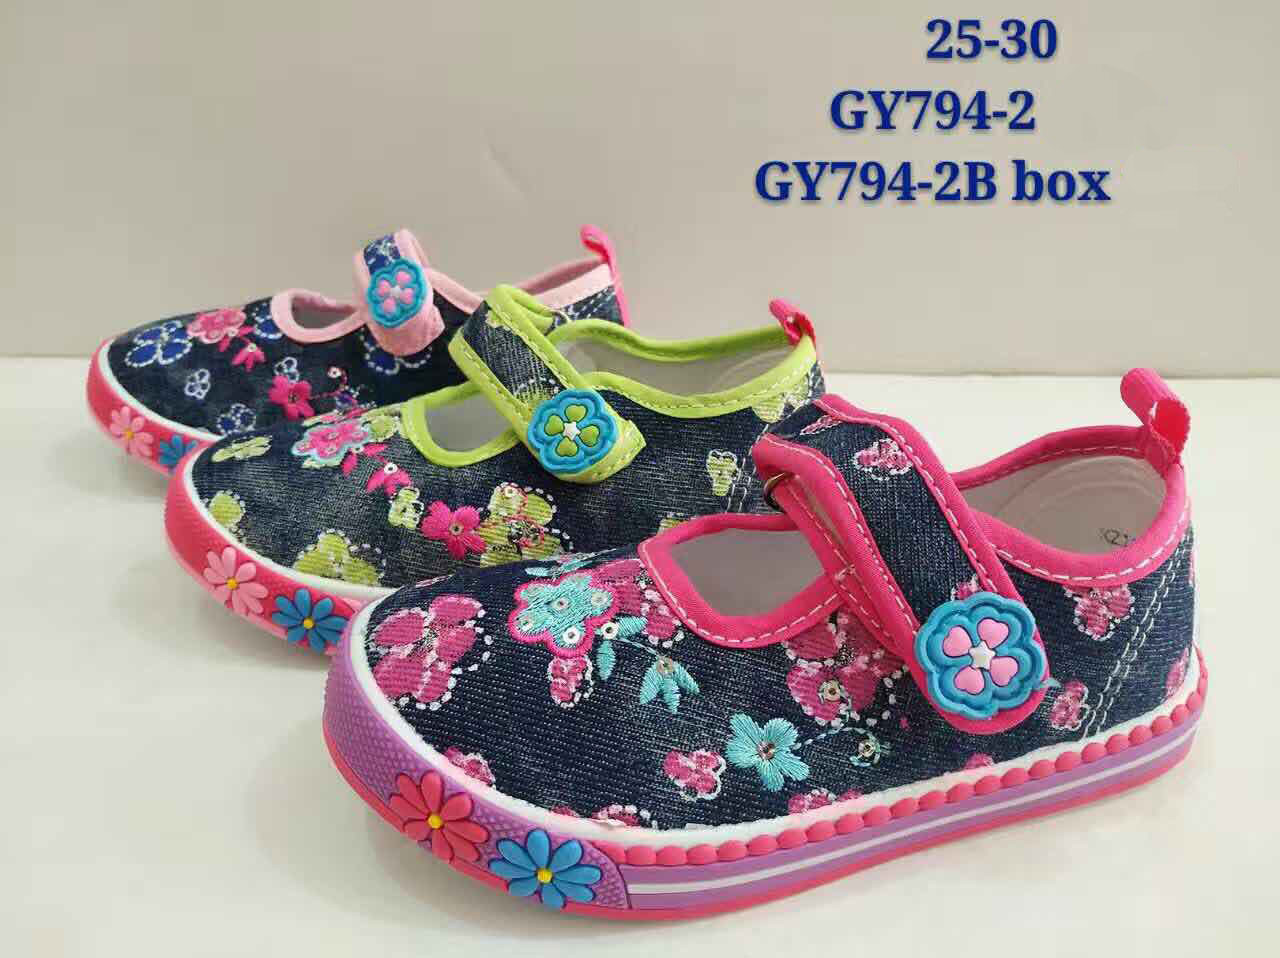 e53c5c153 Обувь для девочек, размеры 25-30., арт. GY794-2, цена 147 грн ...